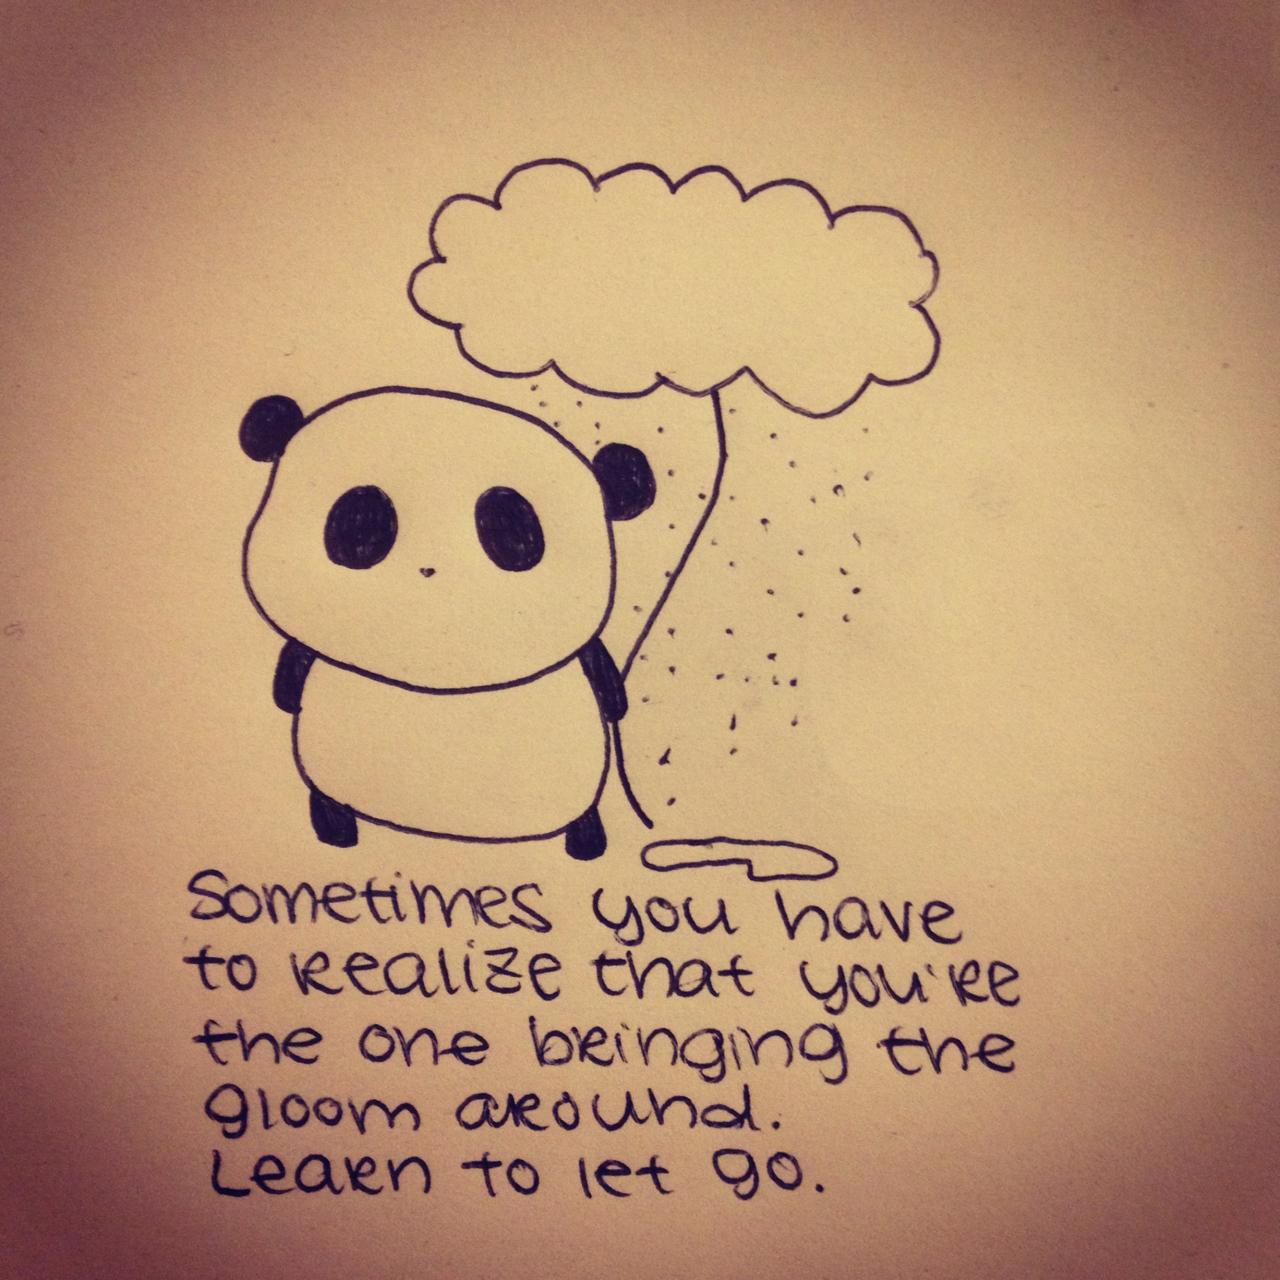 Cute Quotes And Pics: Quotes Simple Cute. QuotesGram